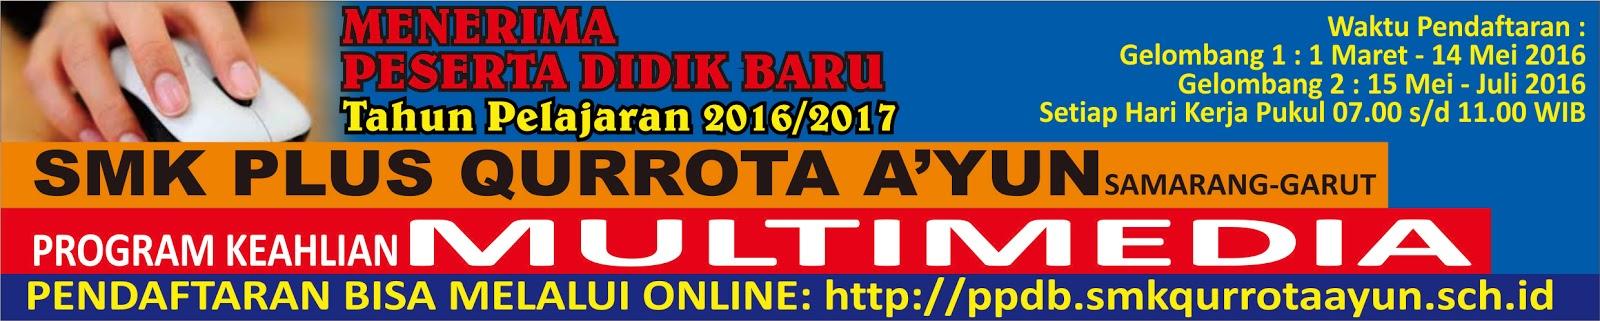 Banner Penerimaan Siswa Baru cdr